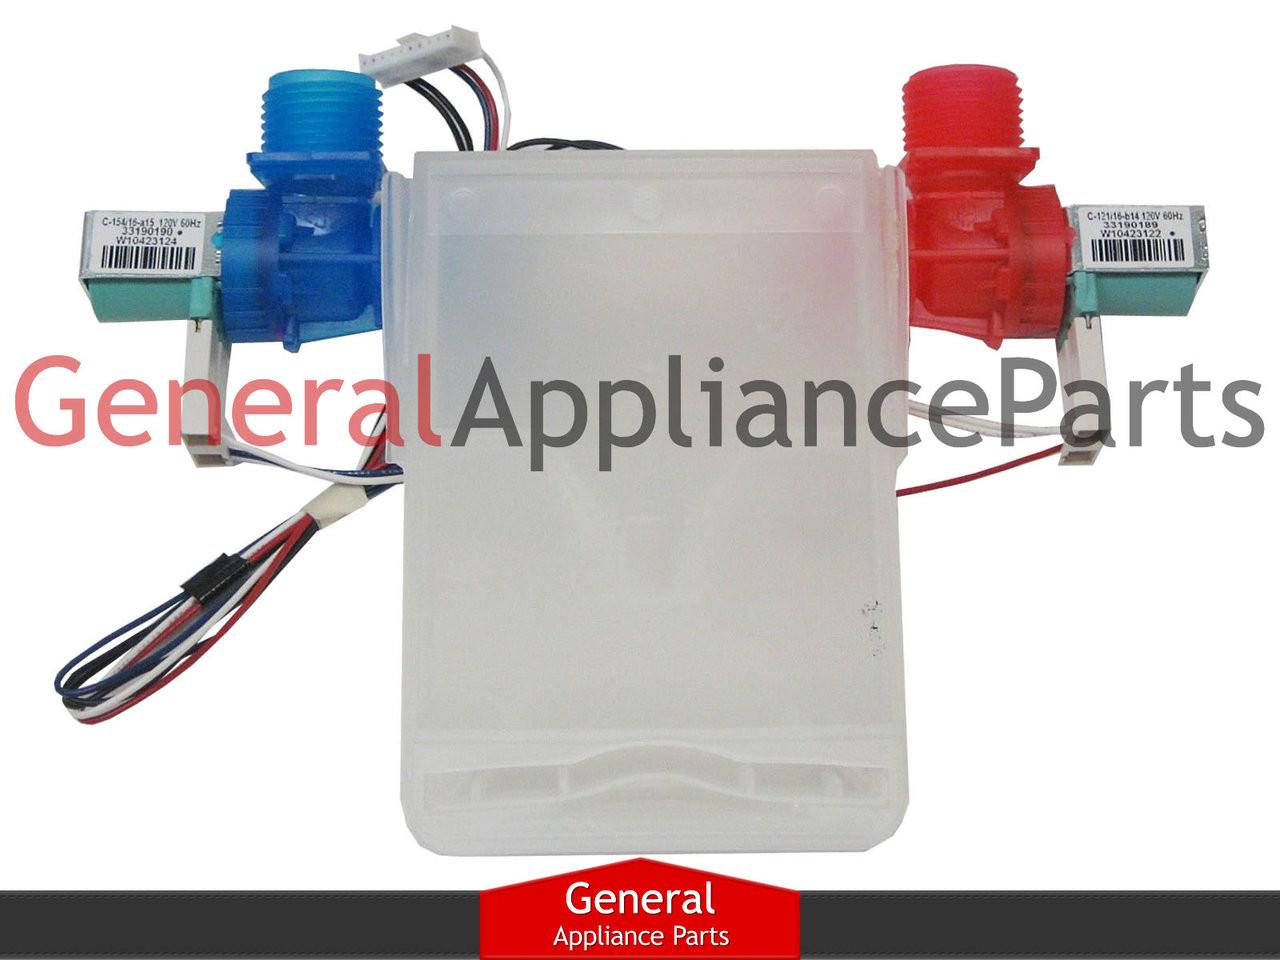 Maytag Washer Washing Machine Water Inlet Valve Assembly 22001604